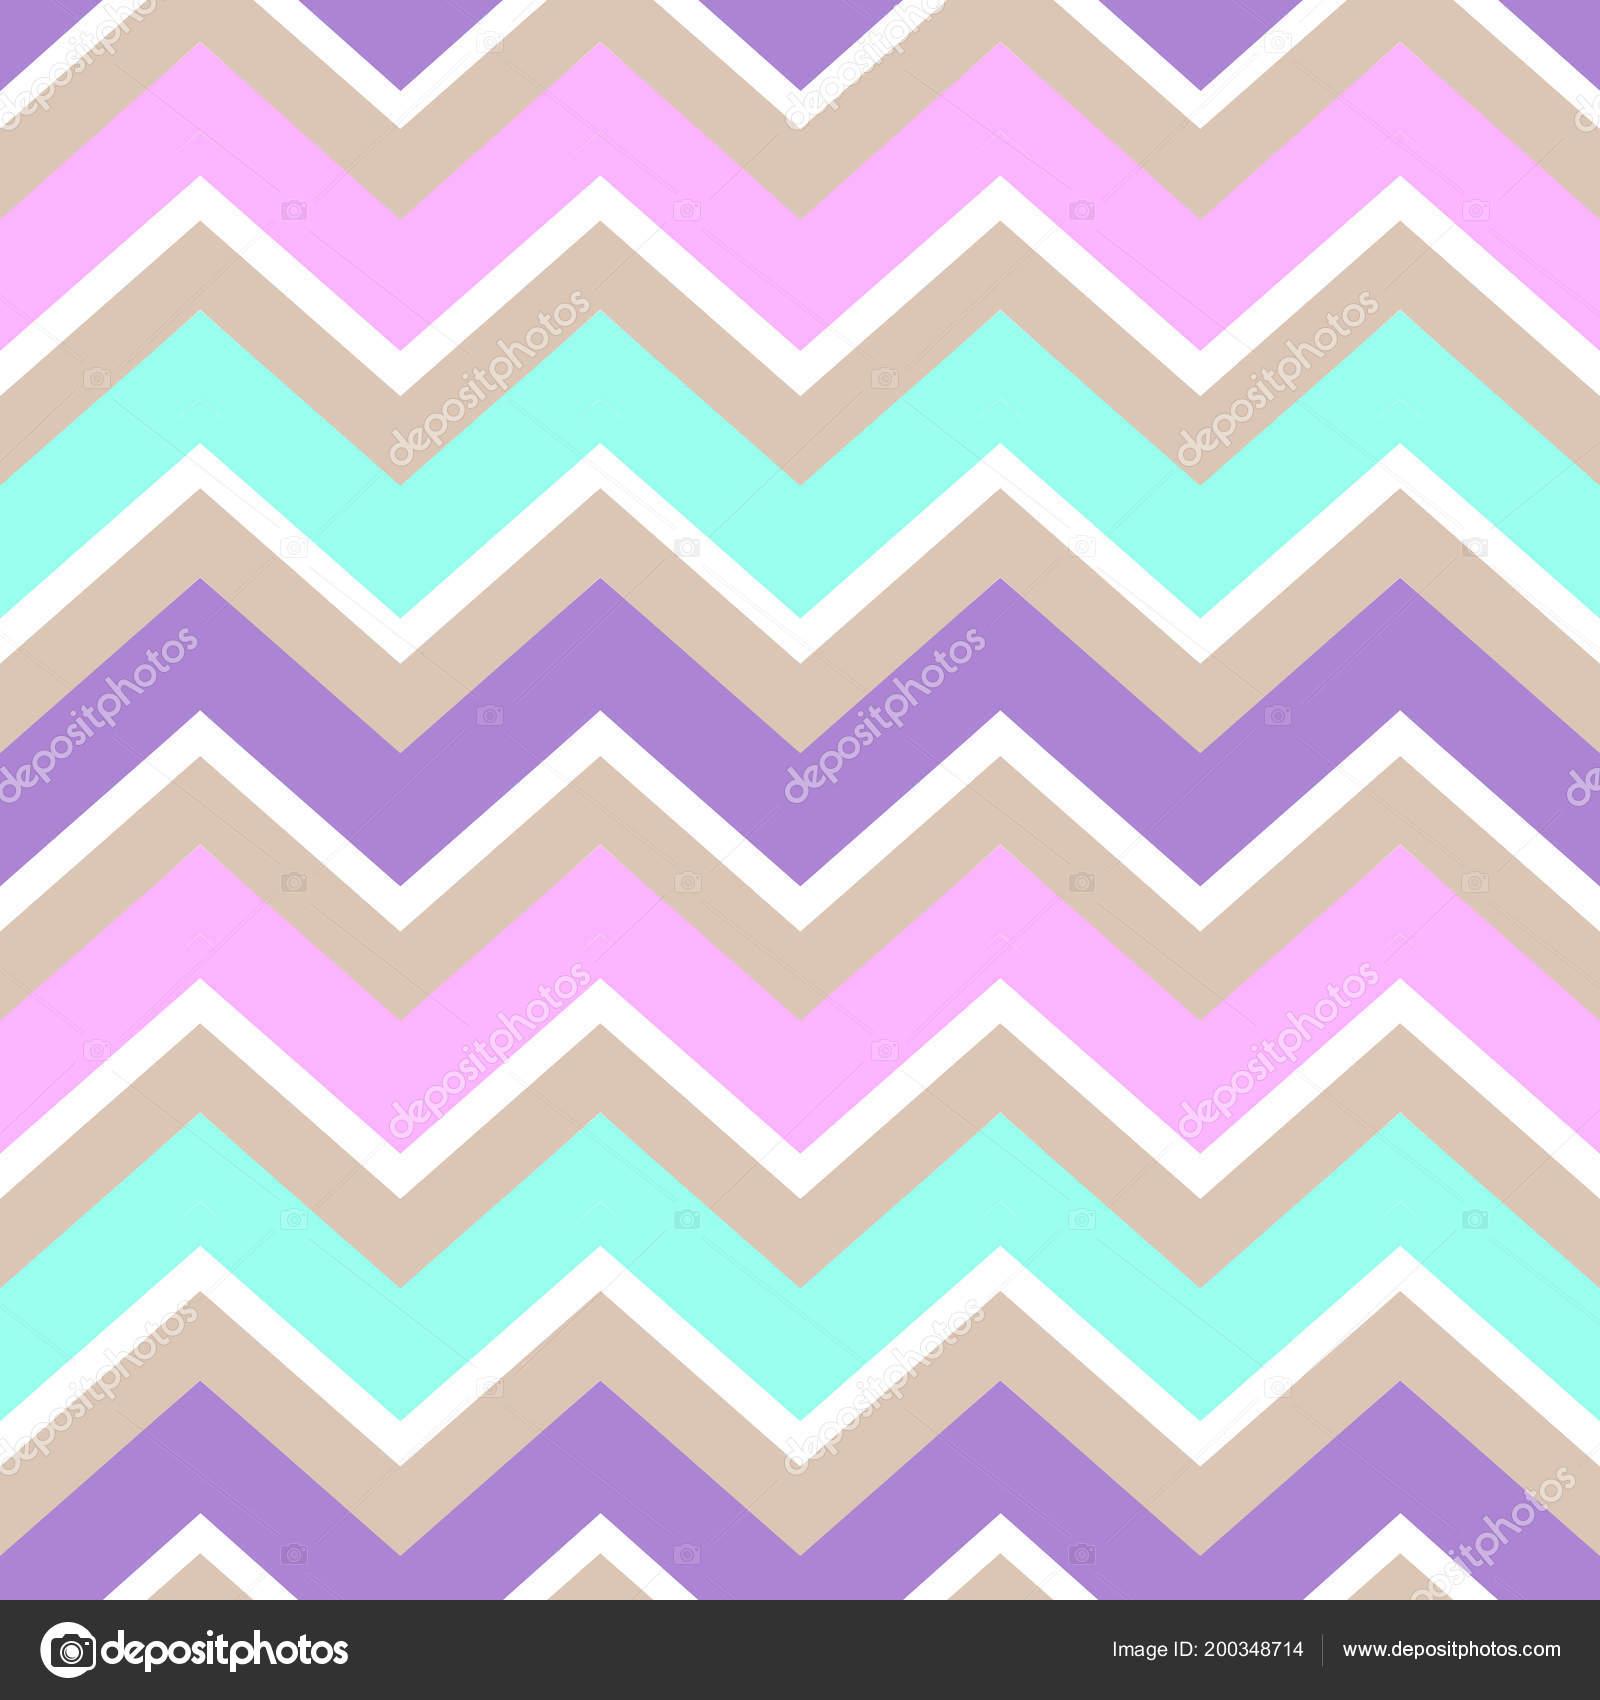 Chevron Turquoise White Purple Pink Cream Color Seamless Pattern Vector